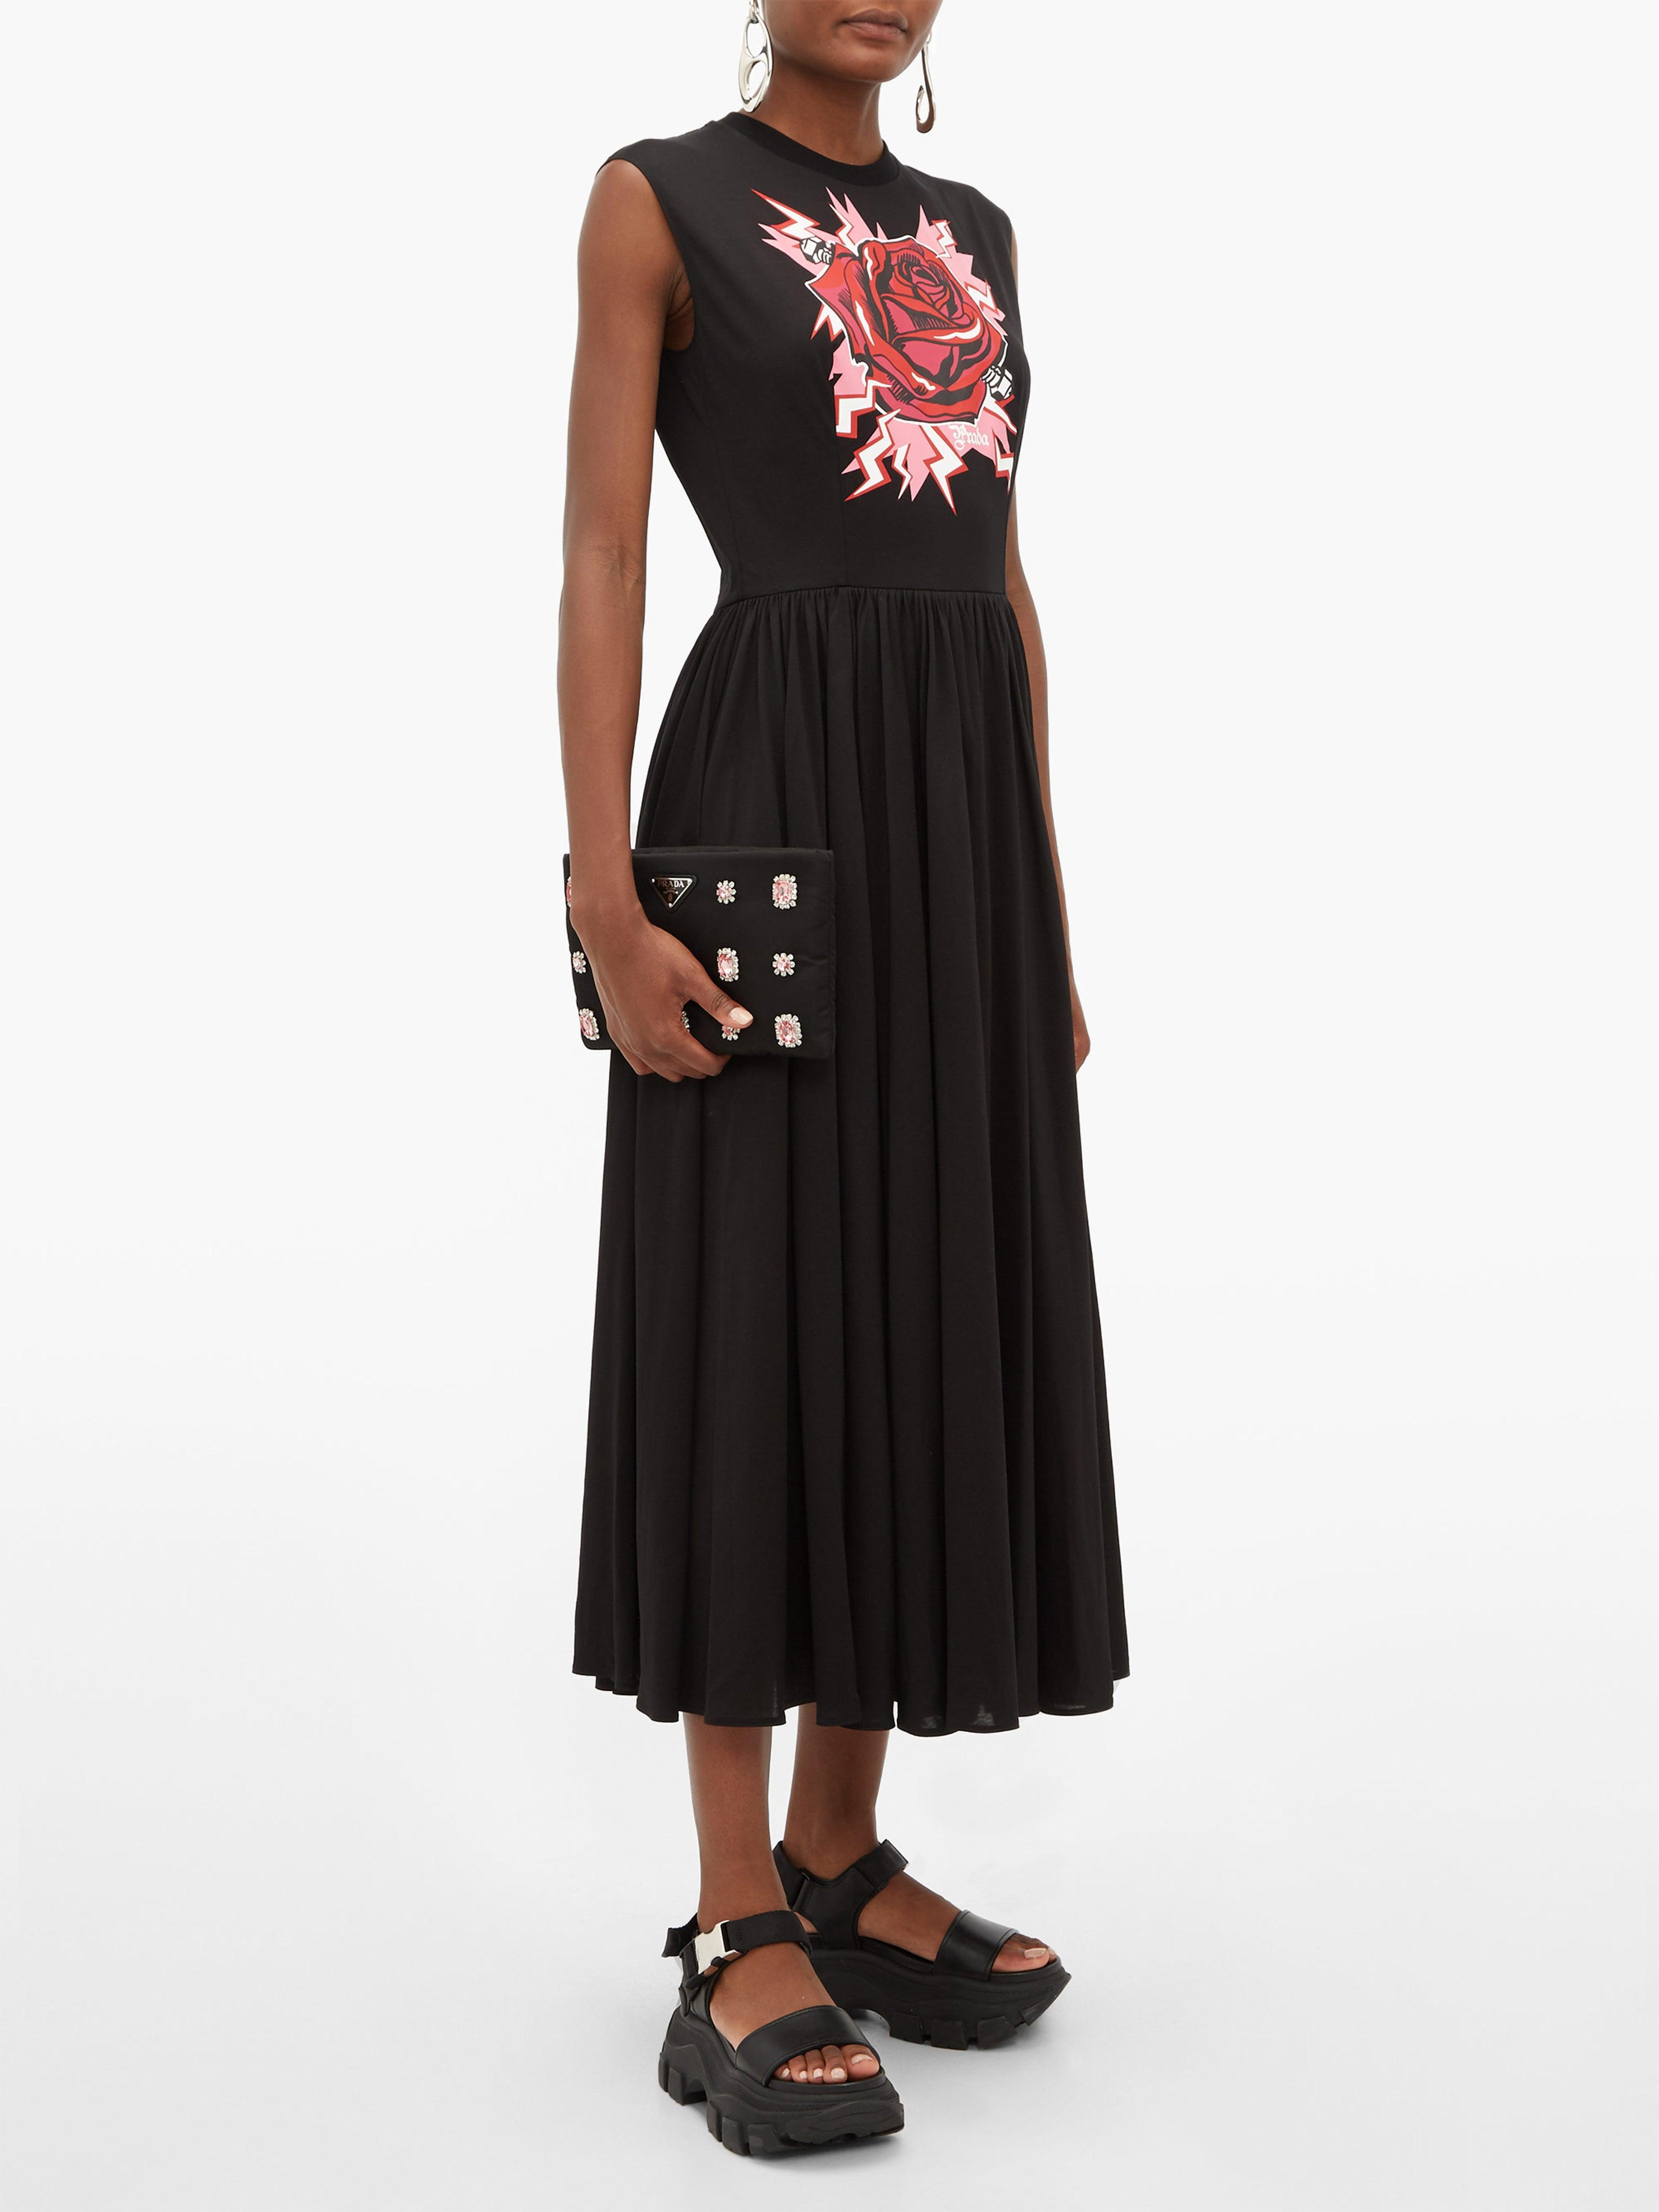 Robe midi en coton à imprimé Electric Rose Prada en coloris Noir